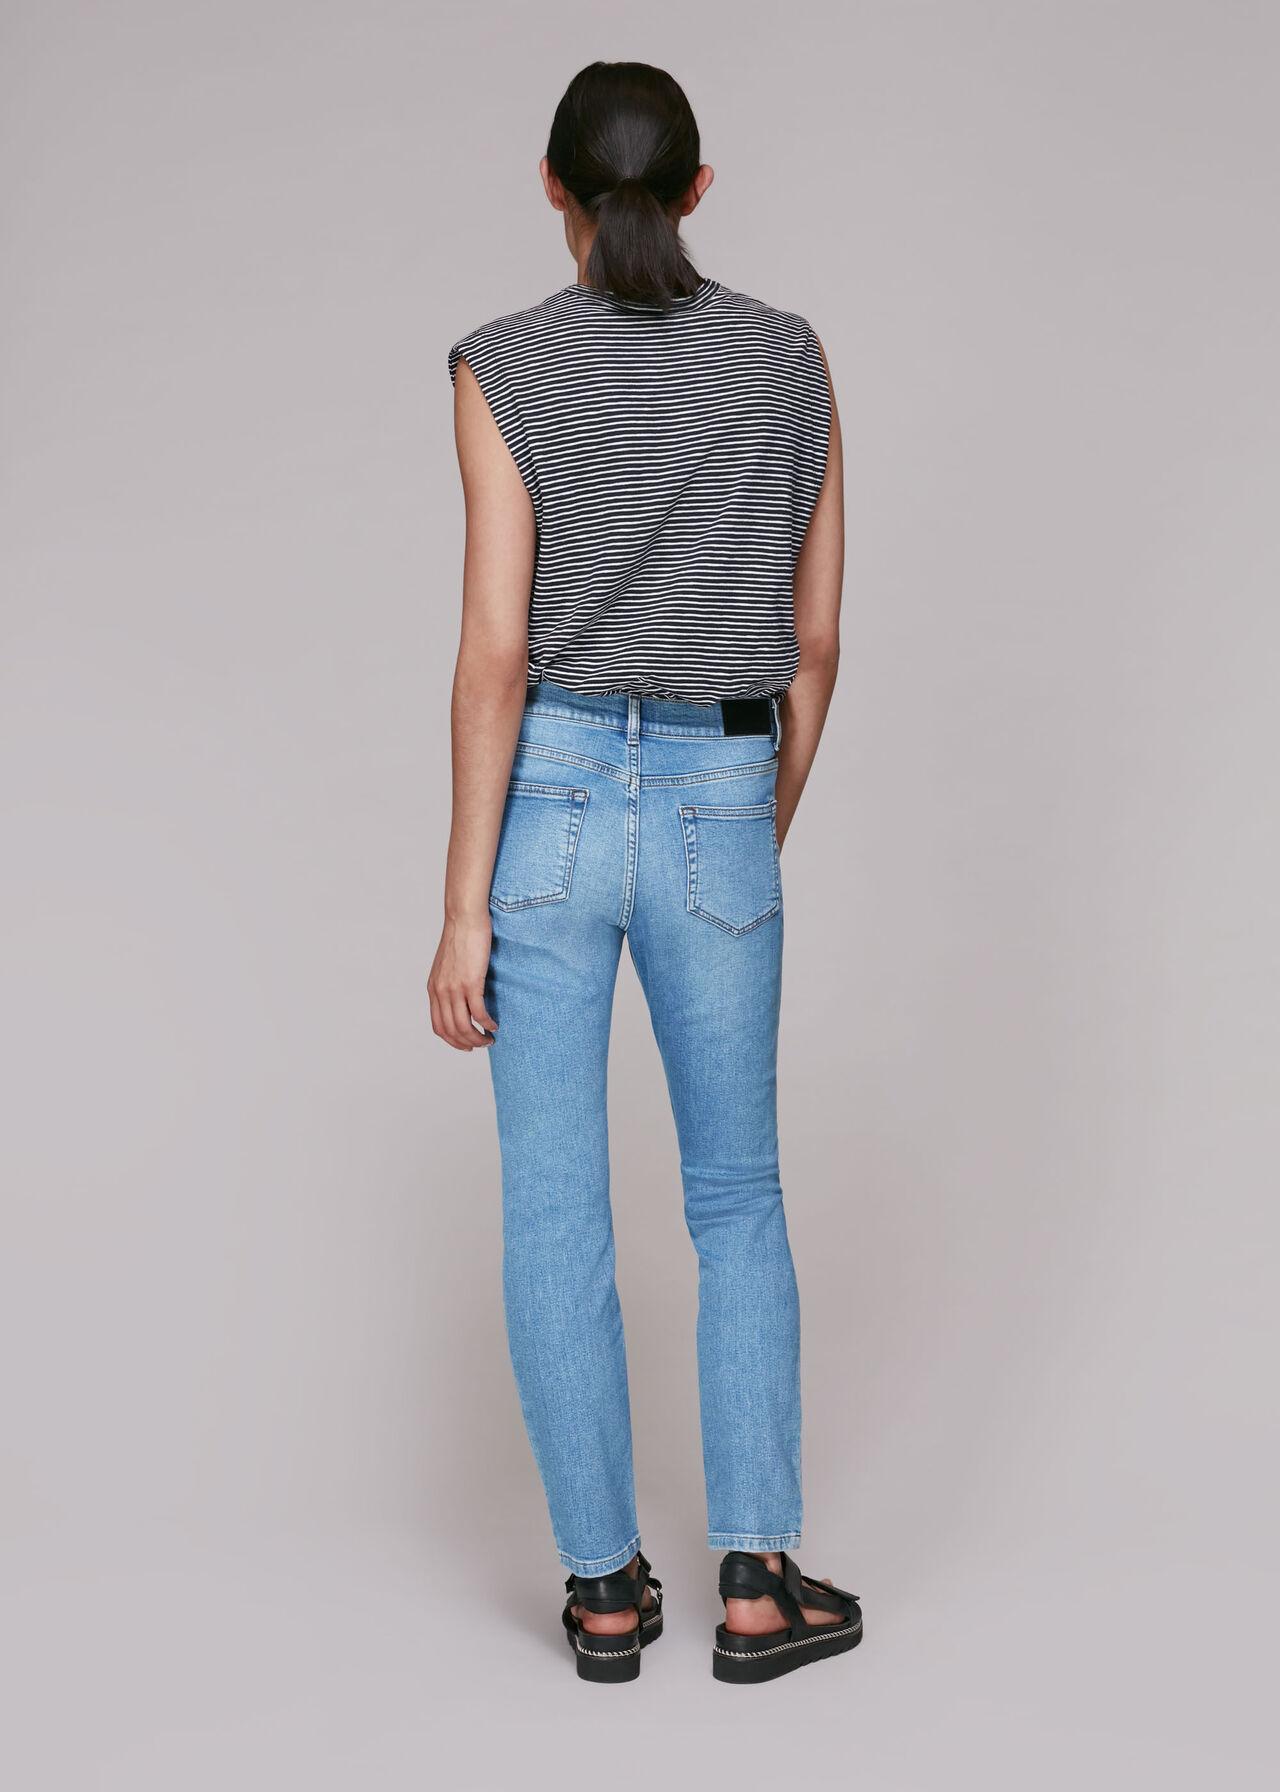 Sculpted Skinny Jean